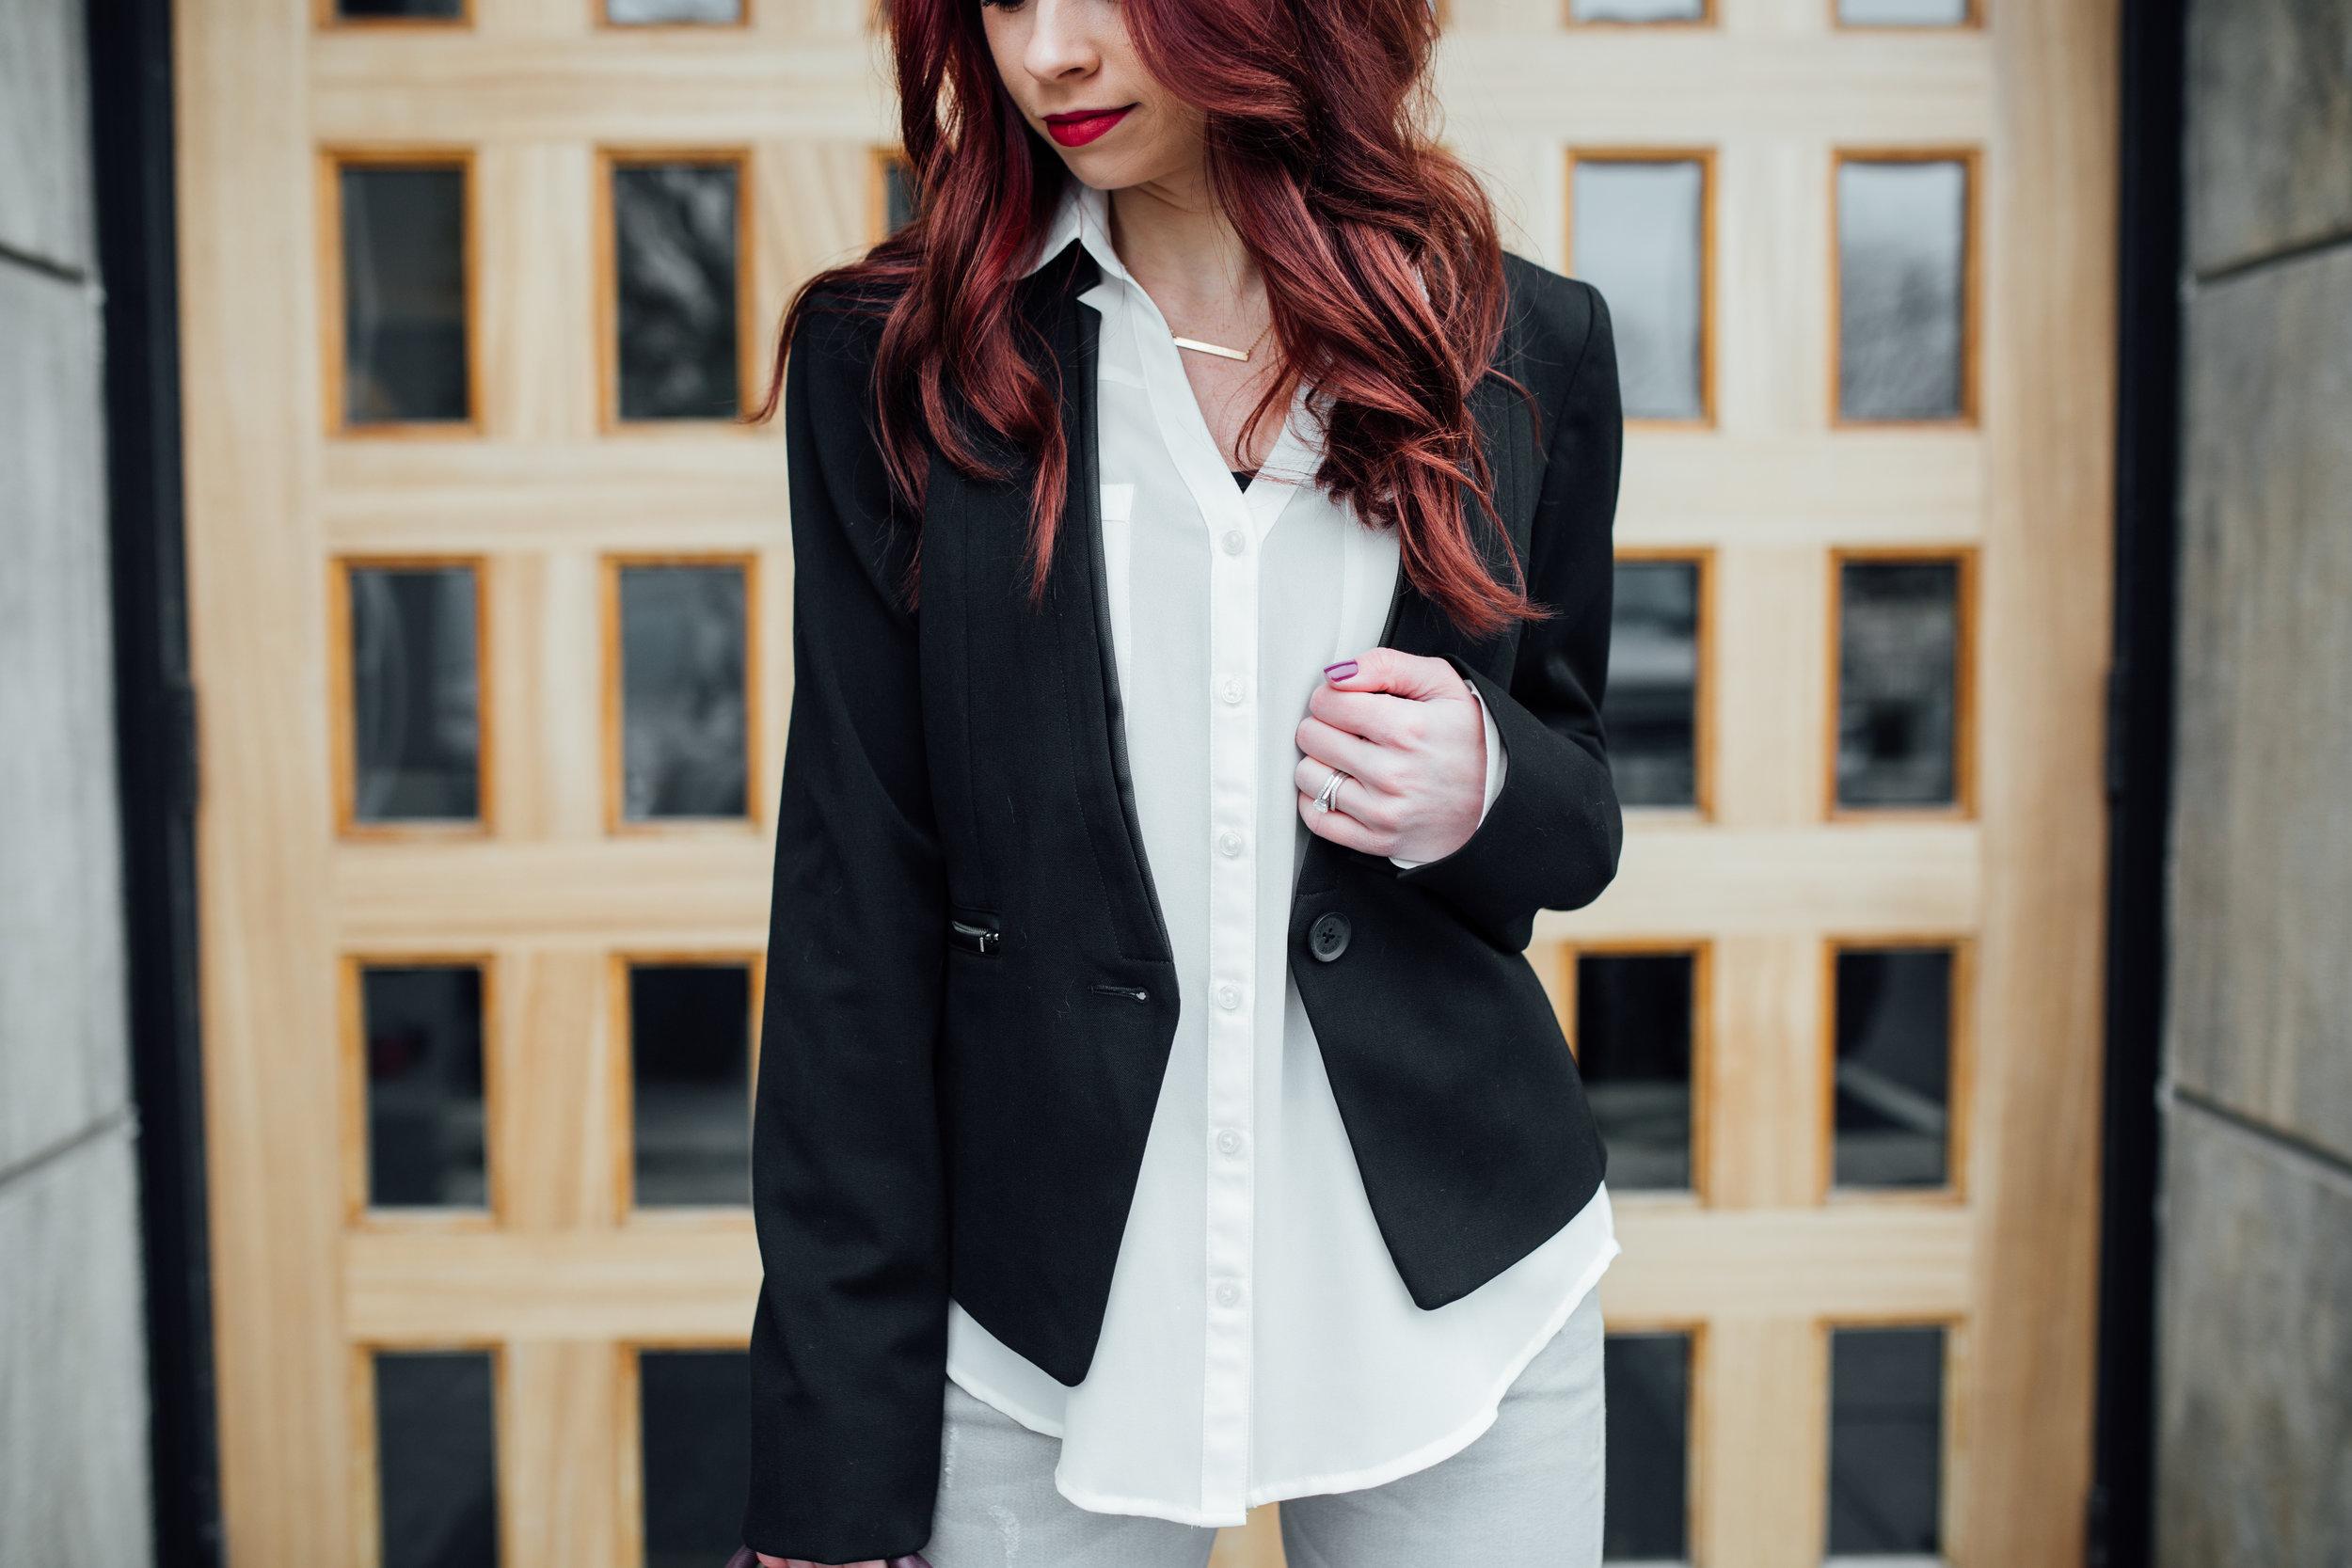 Blazer,  Express  || White Portofino Shirt, Express ||  Grey Ankle Jeans , Express || Mulled Wine Purse,  Kate Spade  || Bar Necklace,  Layered and Long  || Maroon Pumps,  Daya by Zendaya  || Photography,  Casey Ardizzone